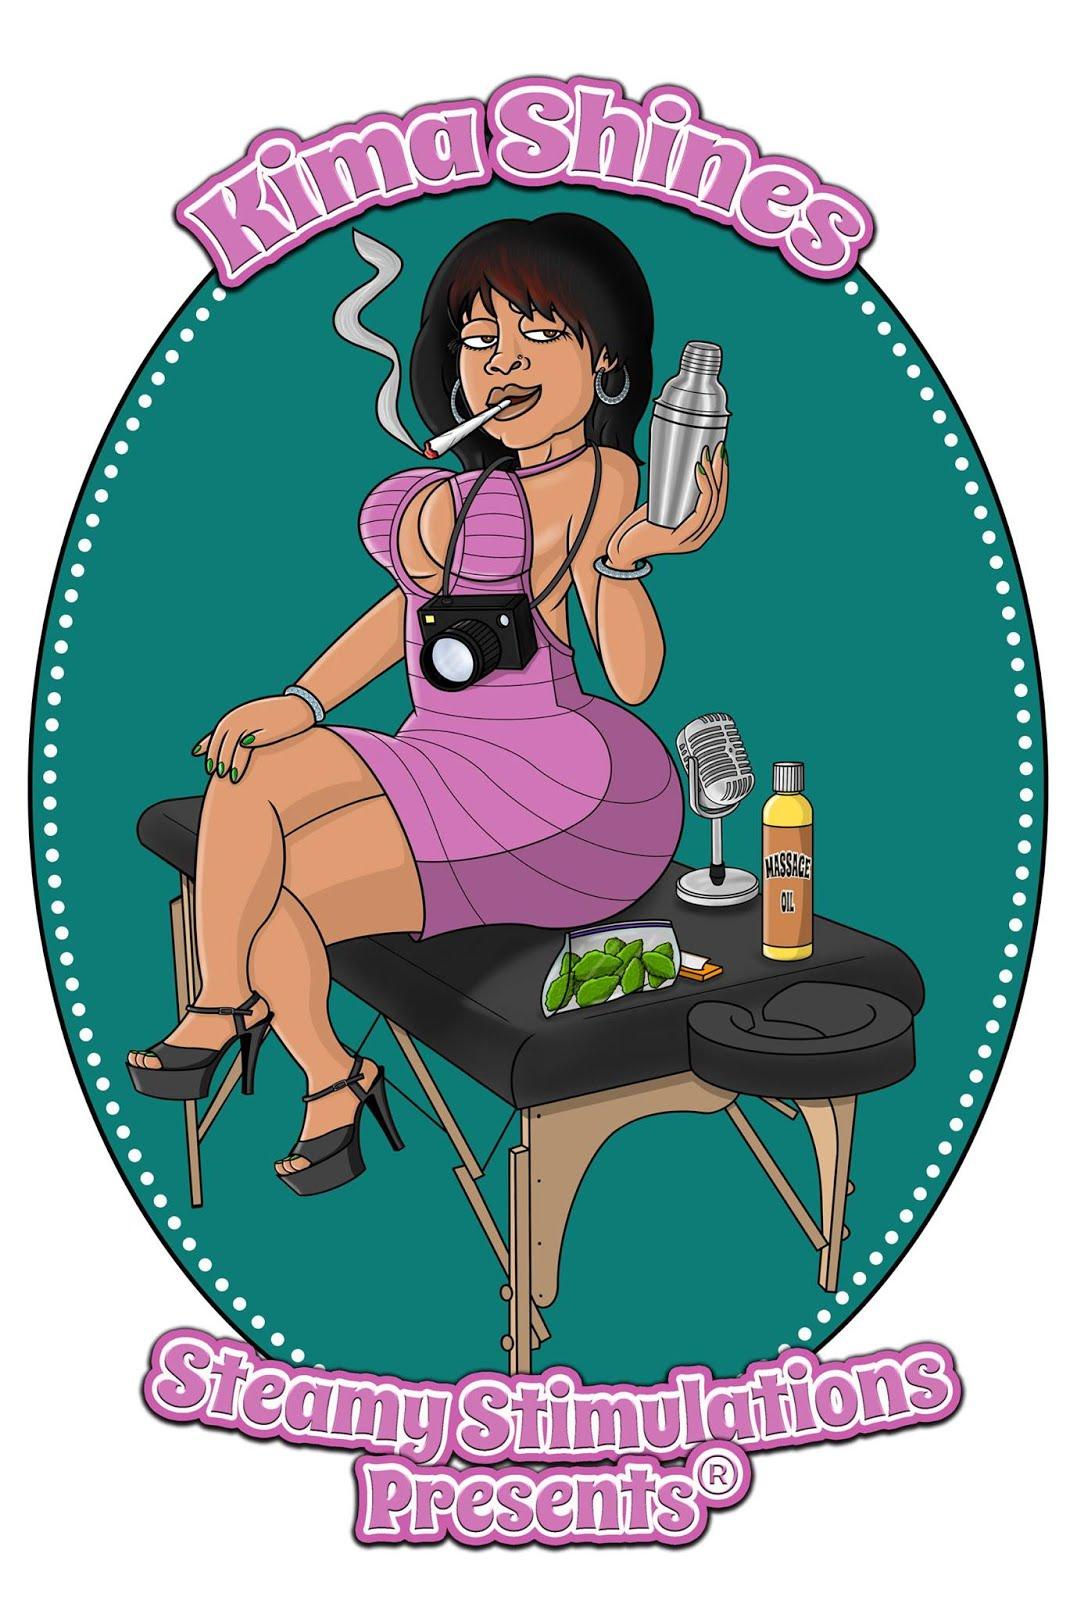 Kima Shines: Steamy Stimulations Presents...®